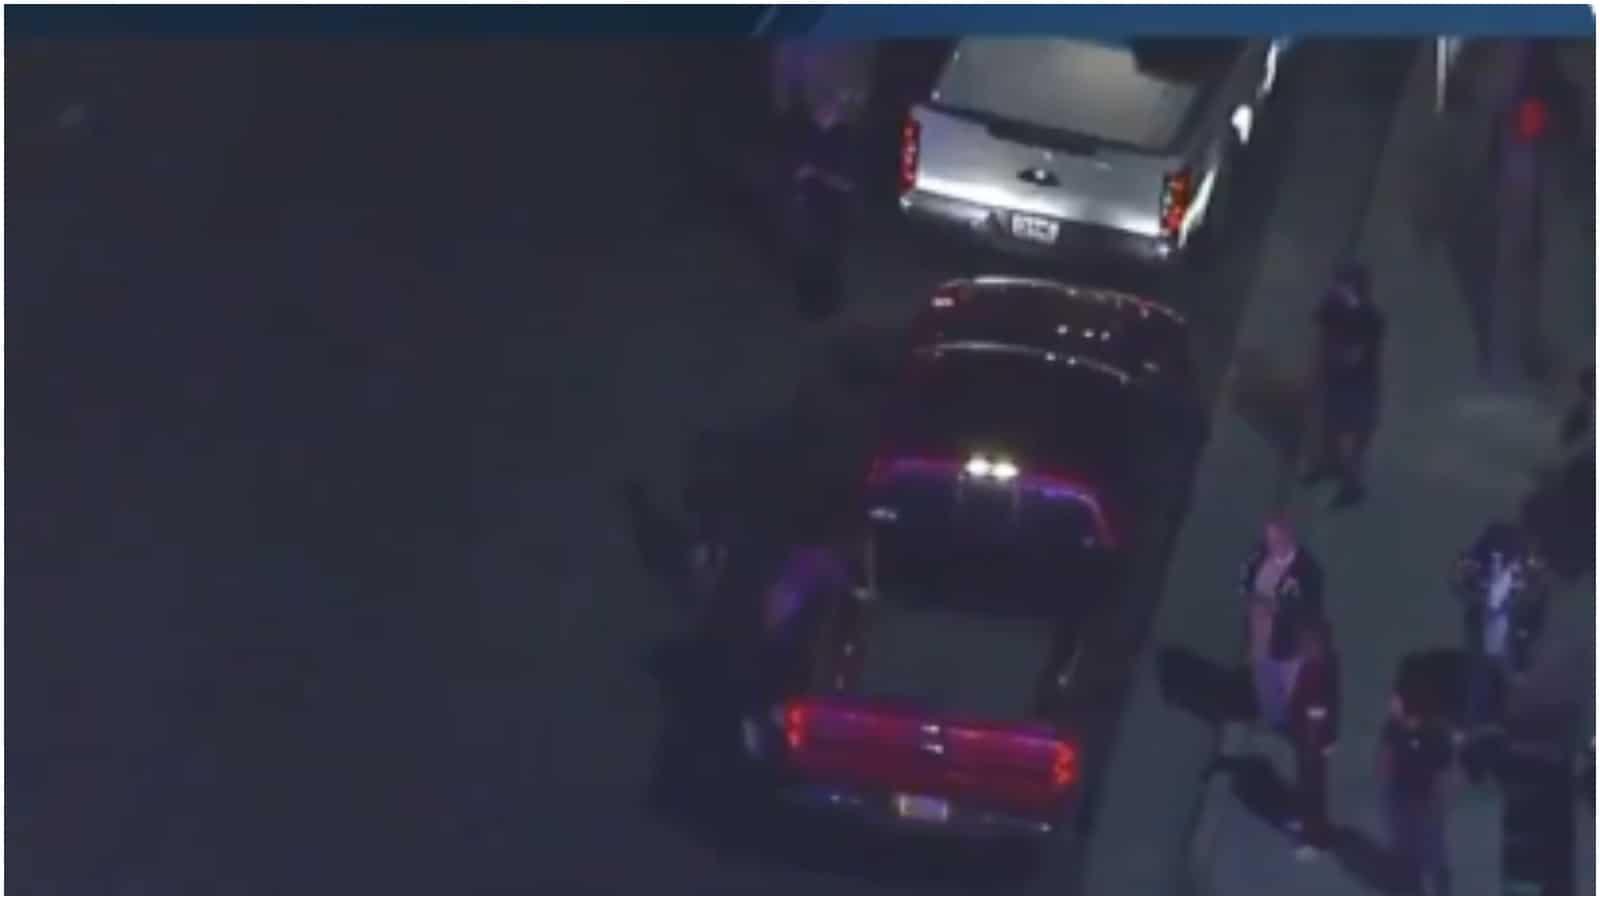 California, Bar shooting, mass shooting, 12 people